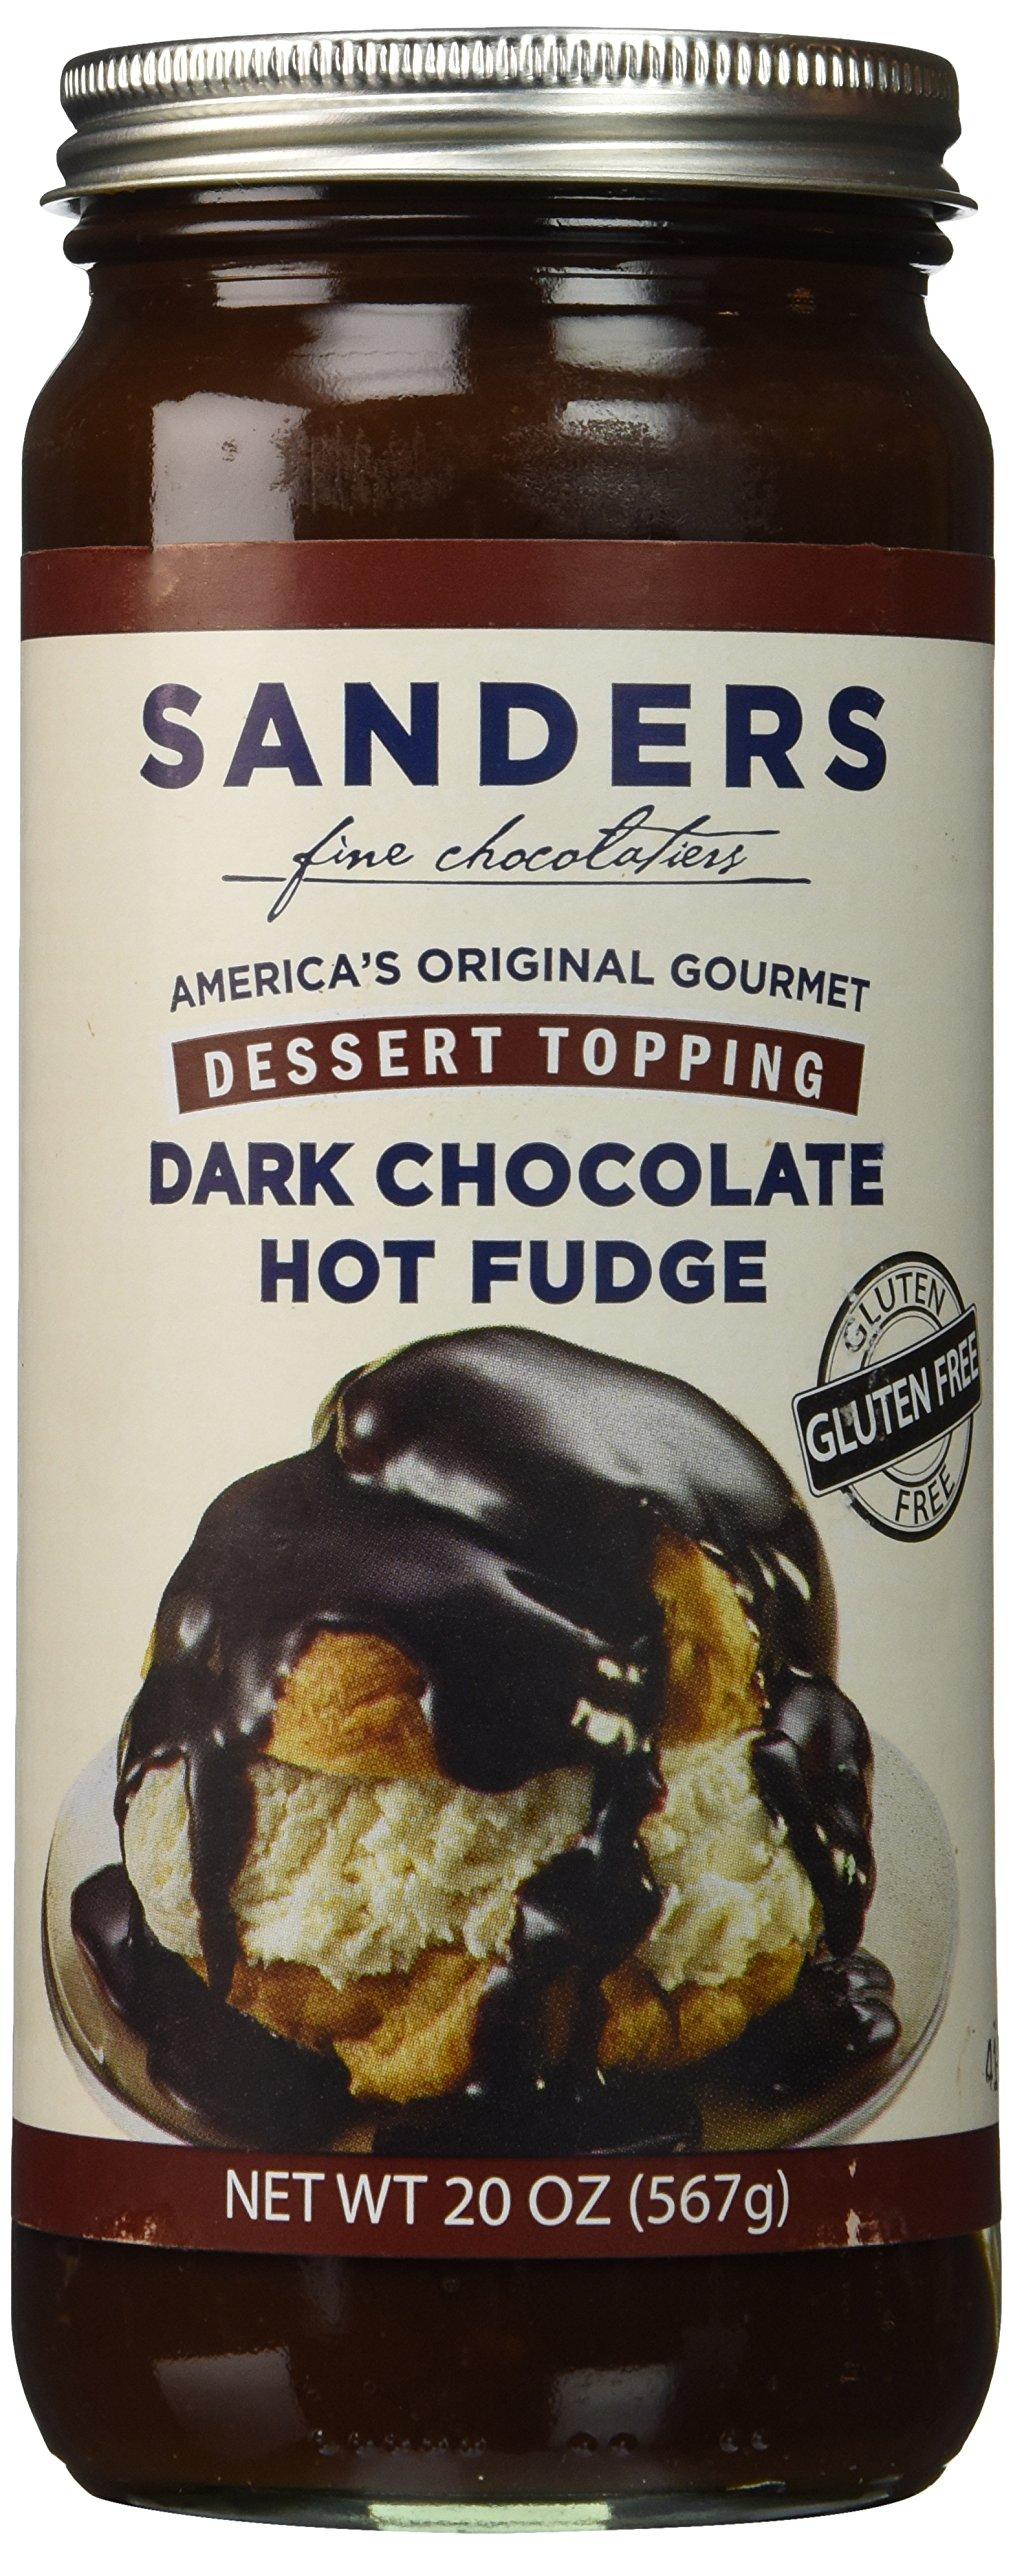 Sanders Hot Fudge (Dark Chocolate Hot Fudge Topping, 20 oz)